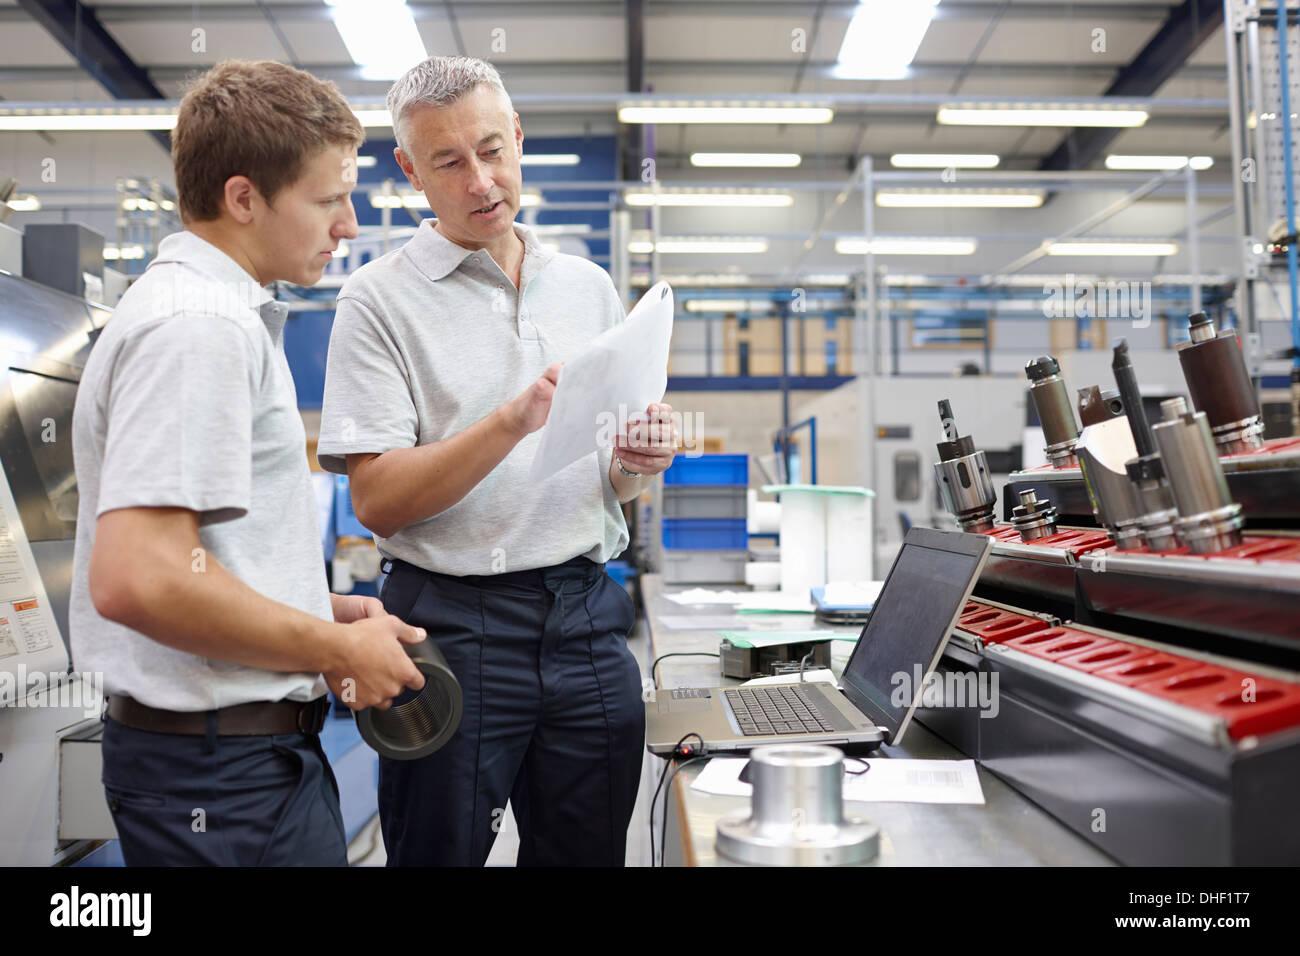 Arbeiter und Manager-meeting in engineering Lager Stockbild